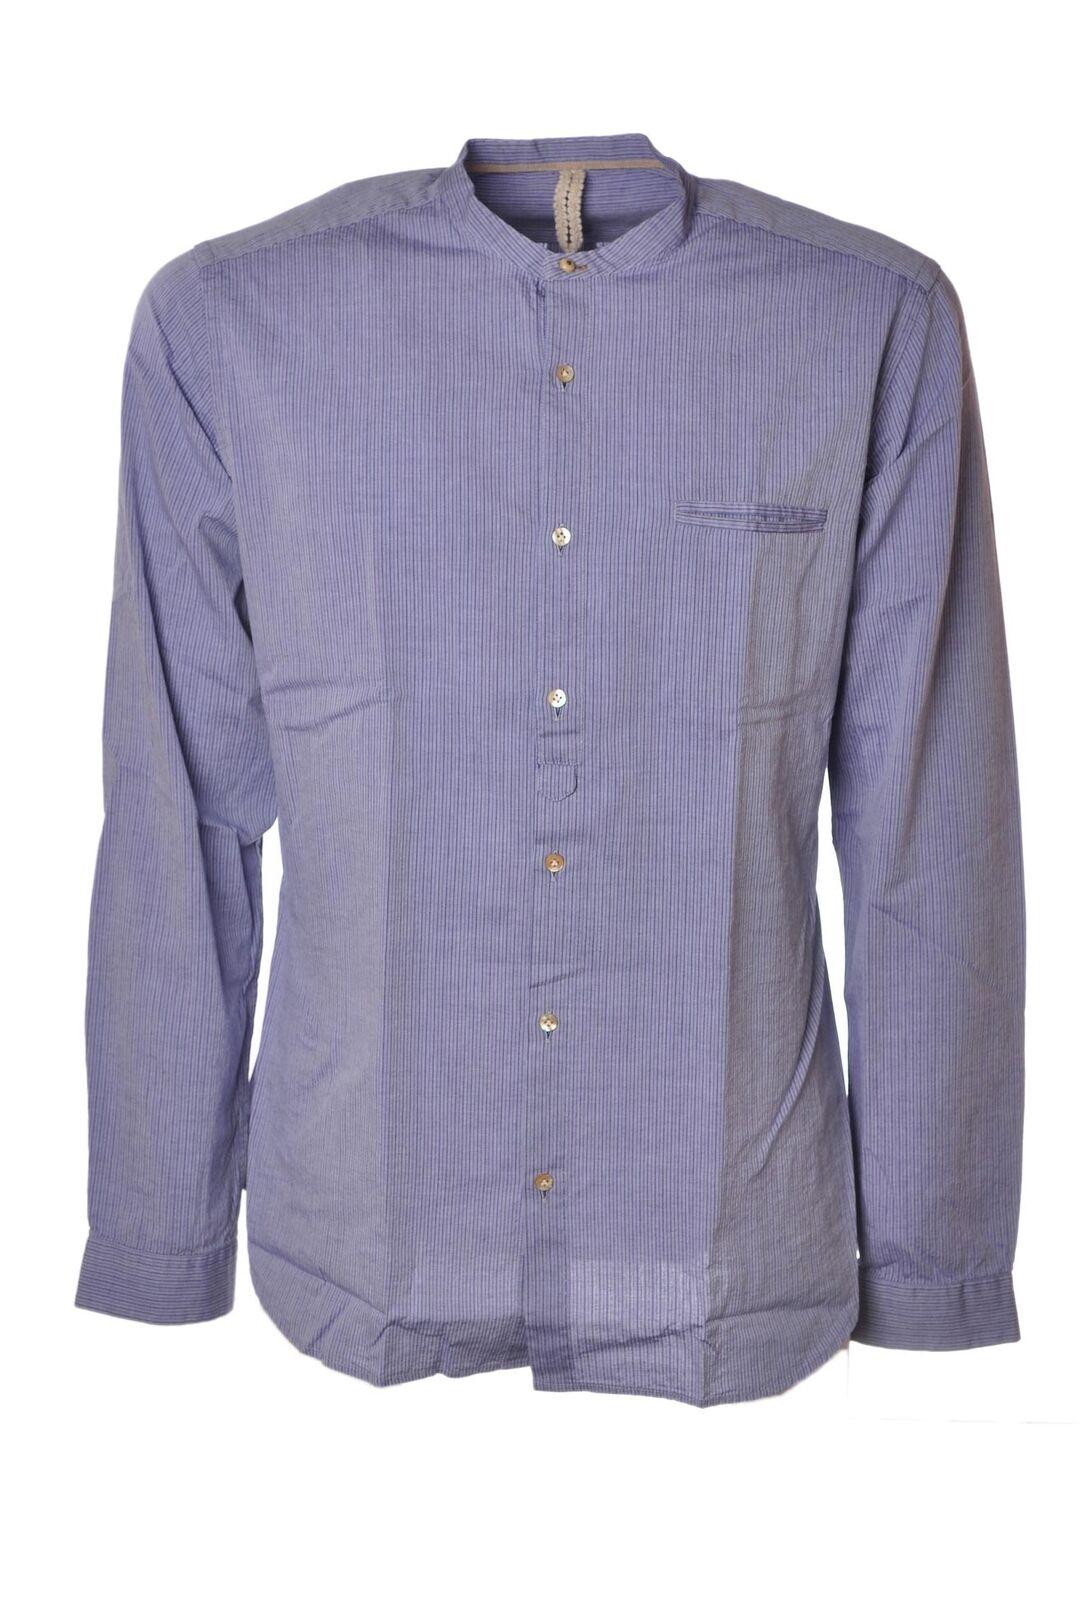 Dnl - hemds-hemds - Man - Blau - 4356906G185140